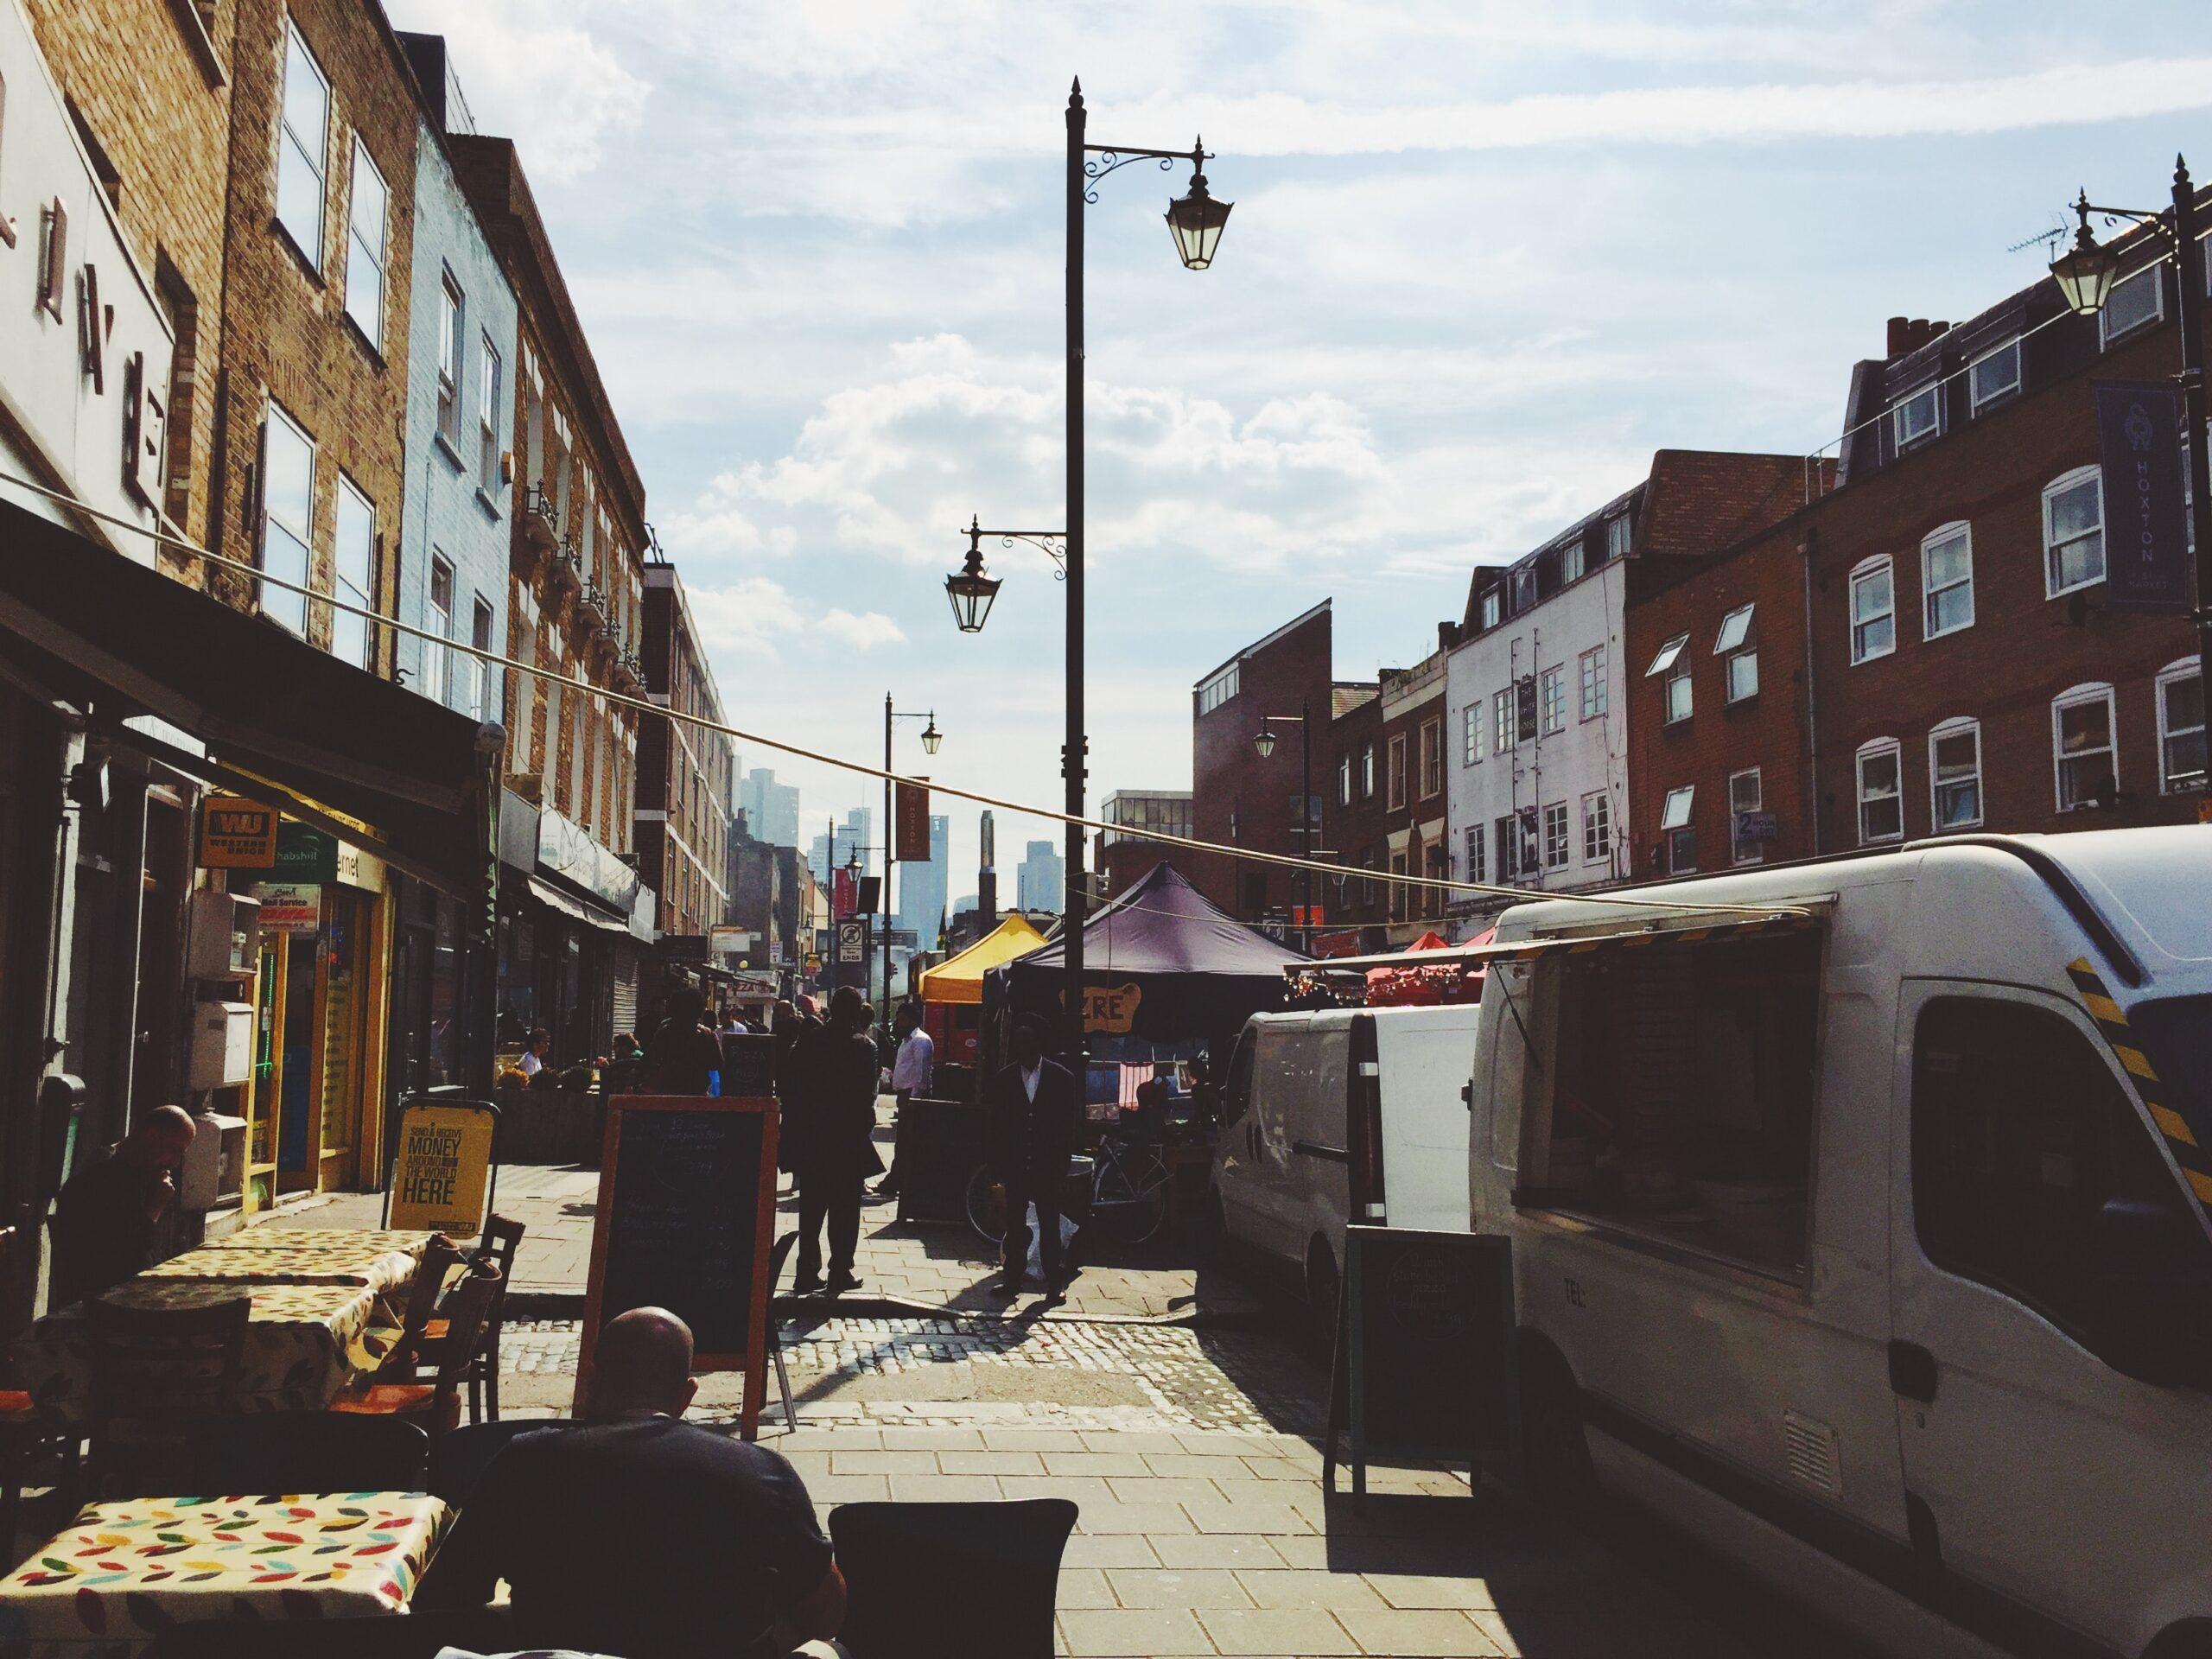 robert-bye-London UK summer street-unsplash